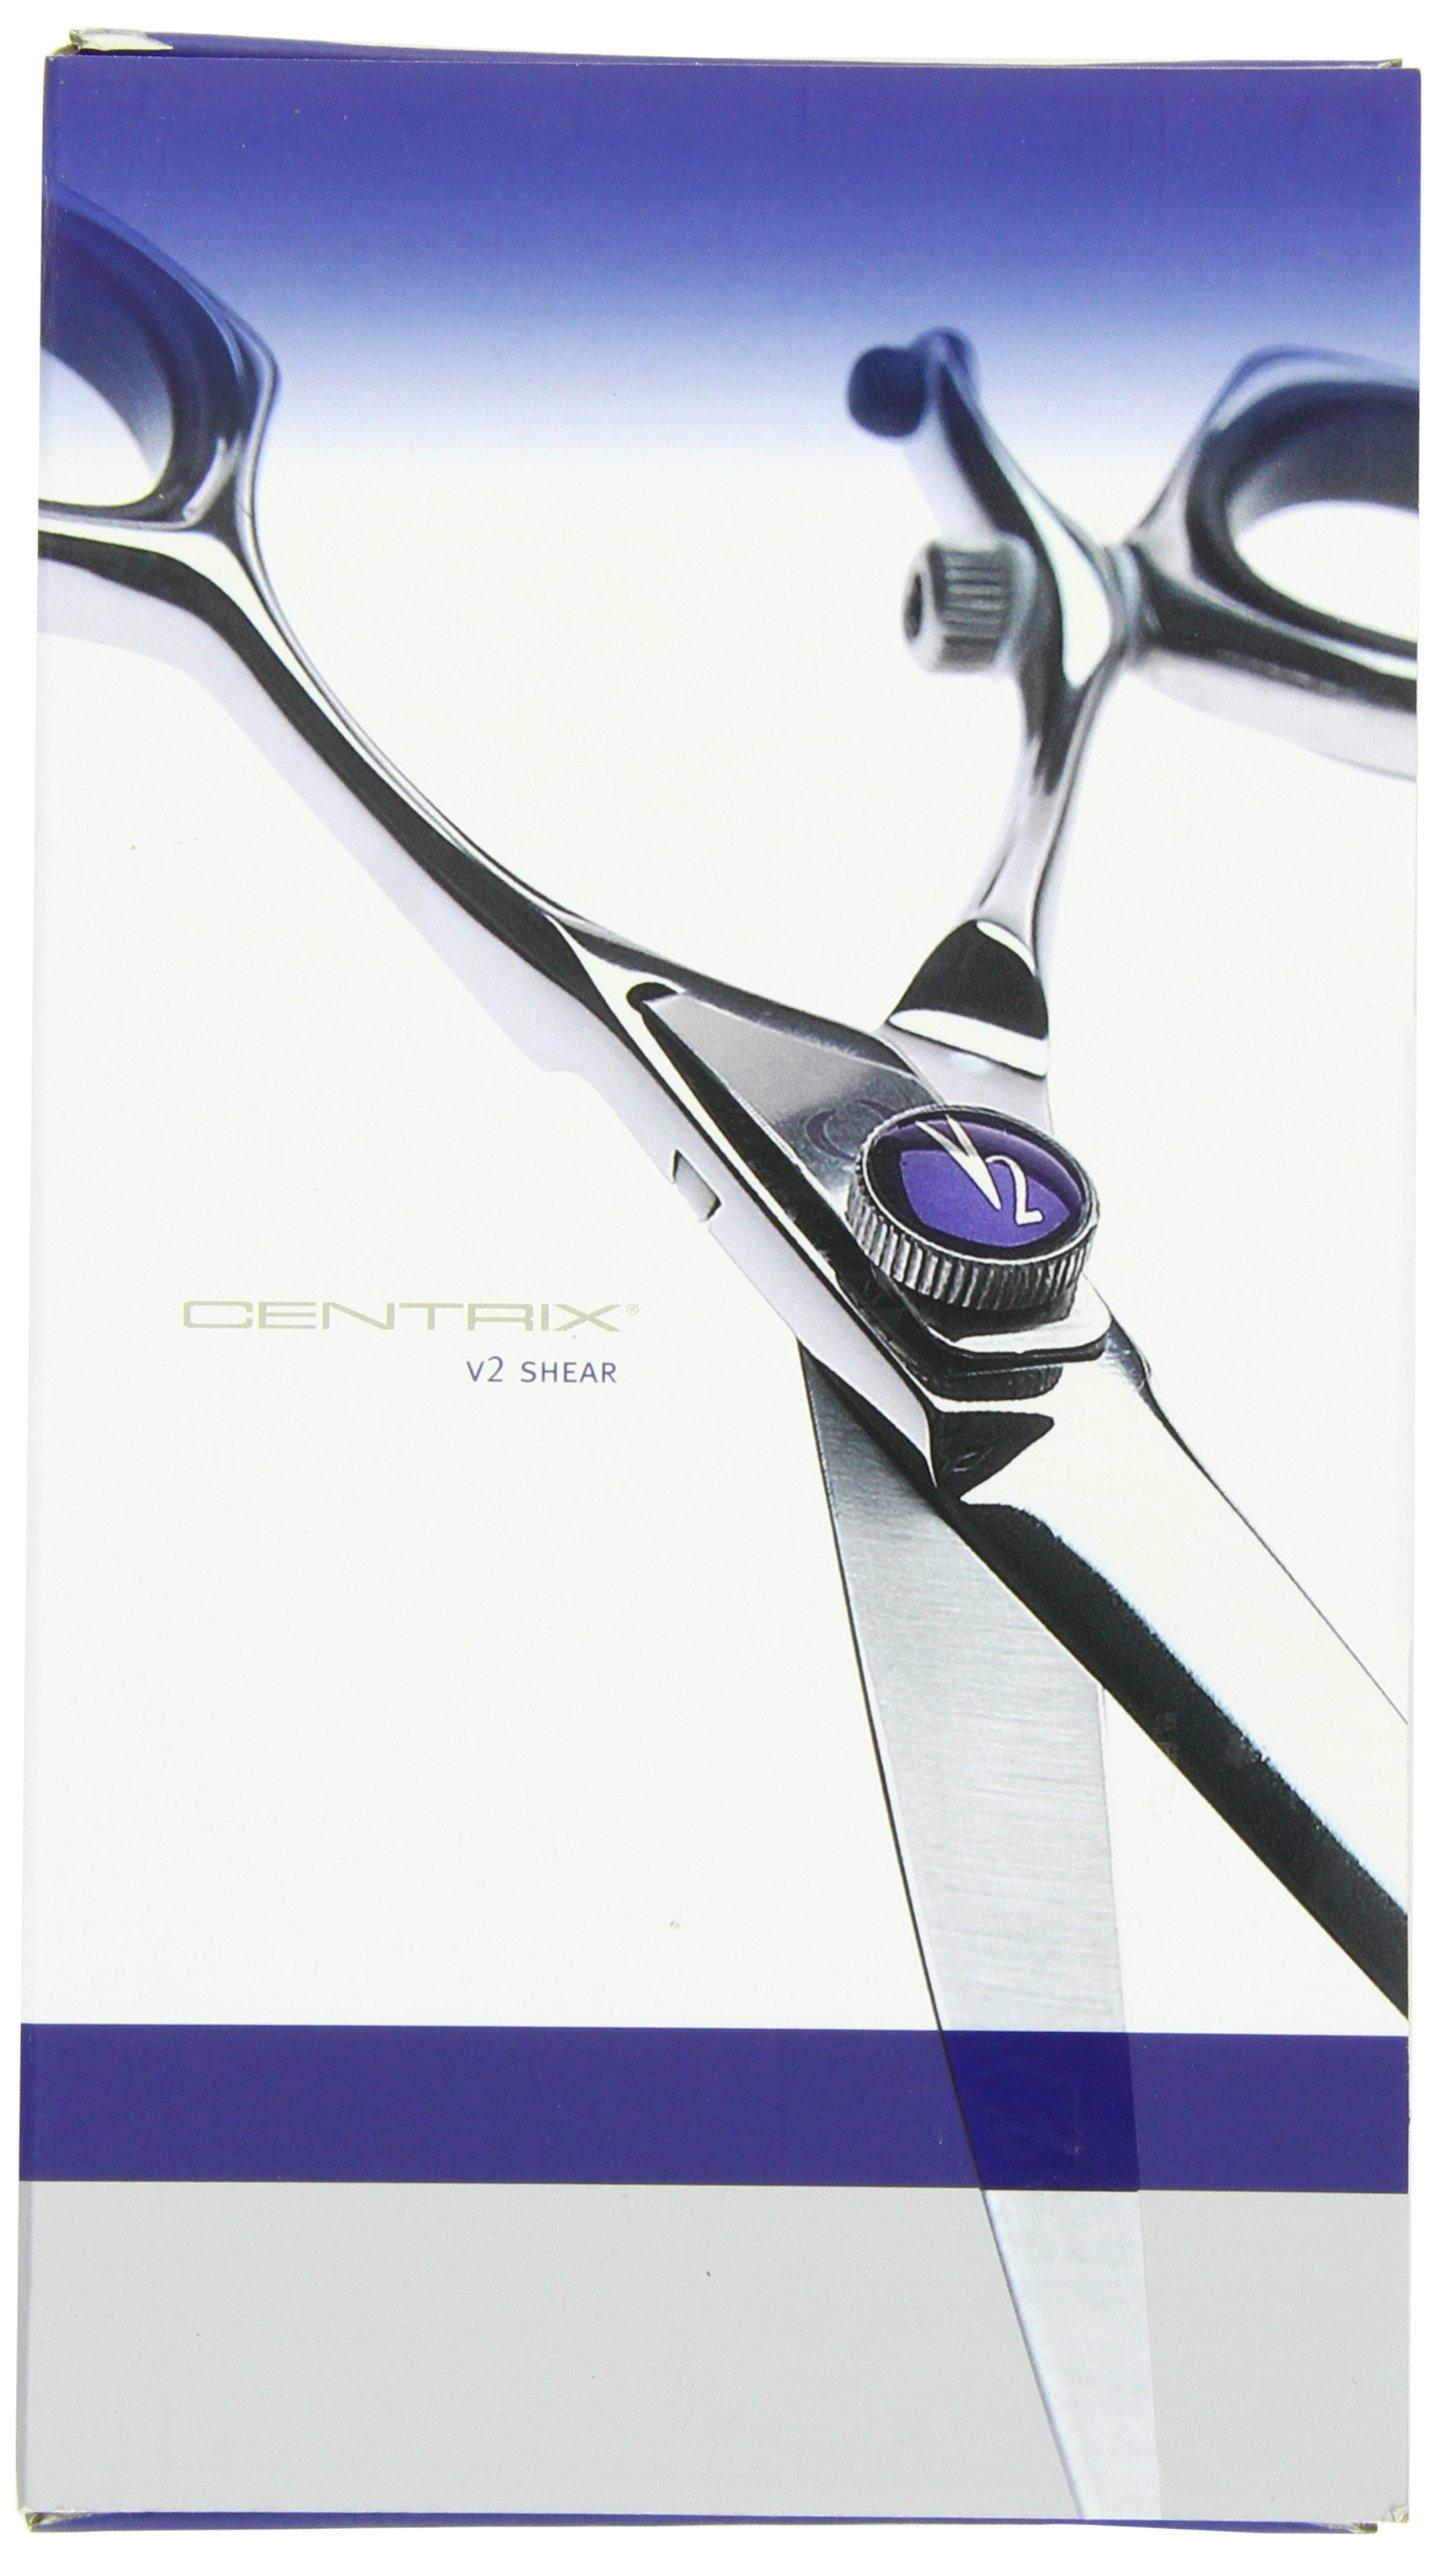 Centrix V2-650 Vortex Professional Shear, 6.5 Inch, 15.36 Ounce